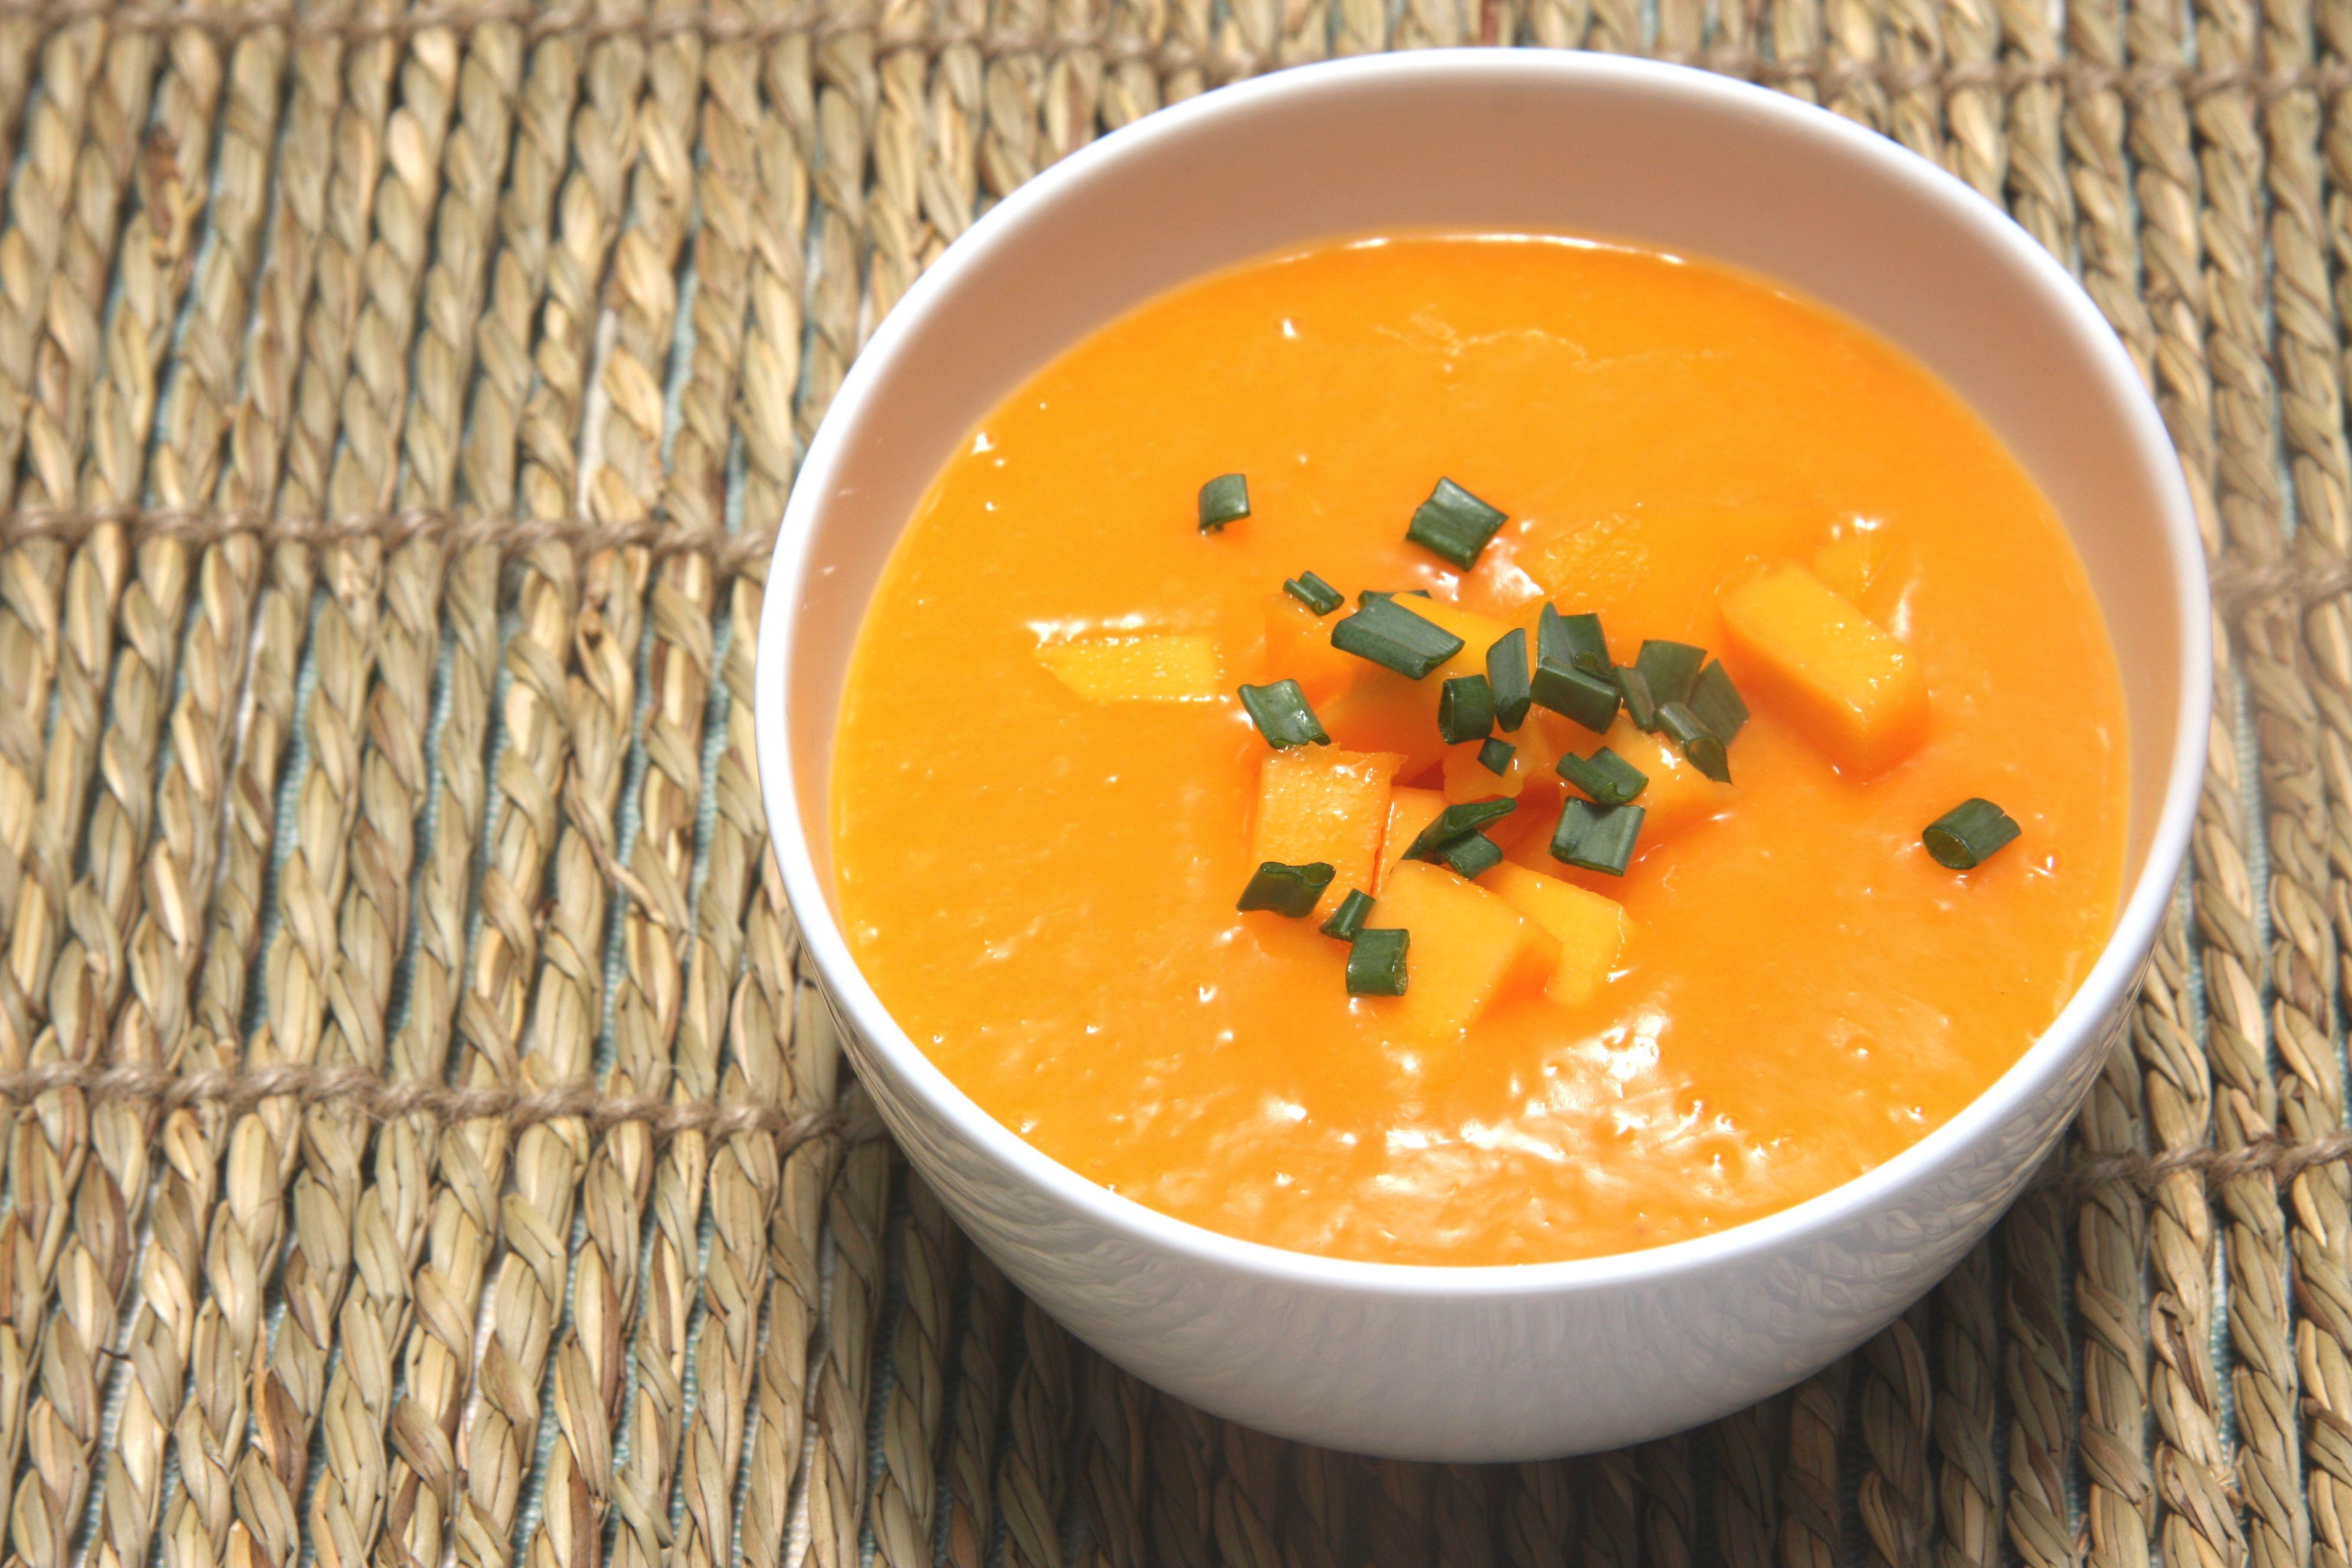 Cold Thai Mango soup